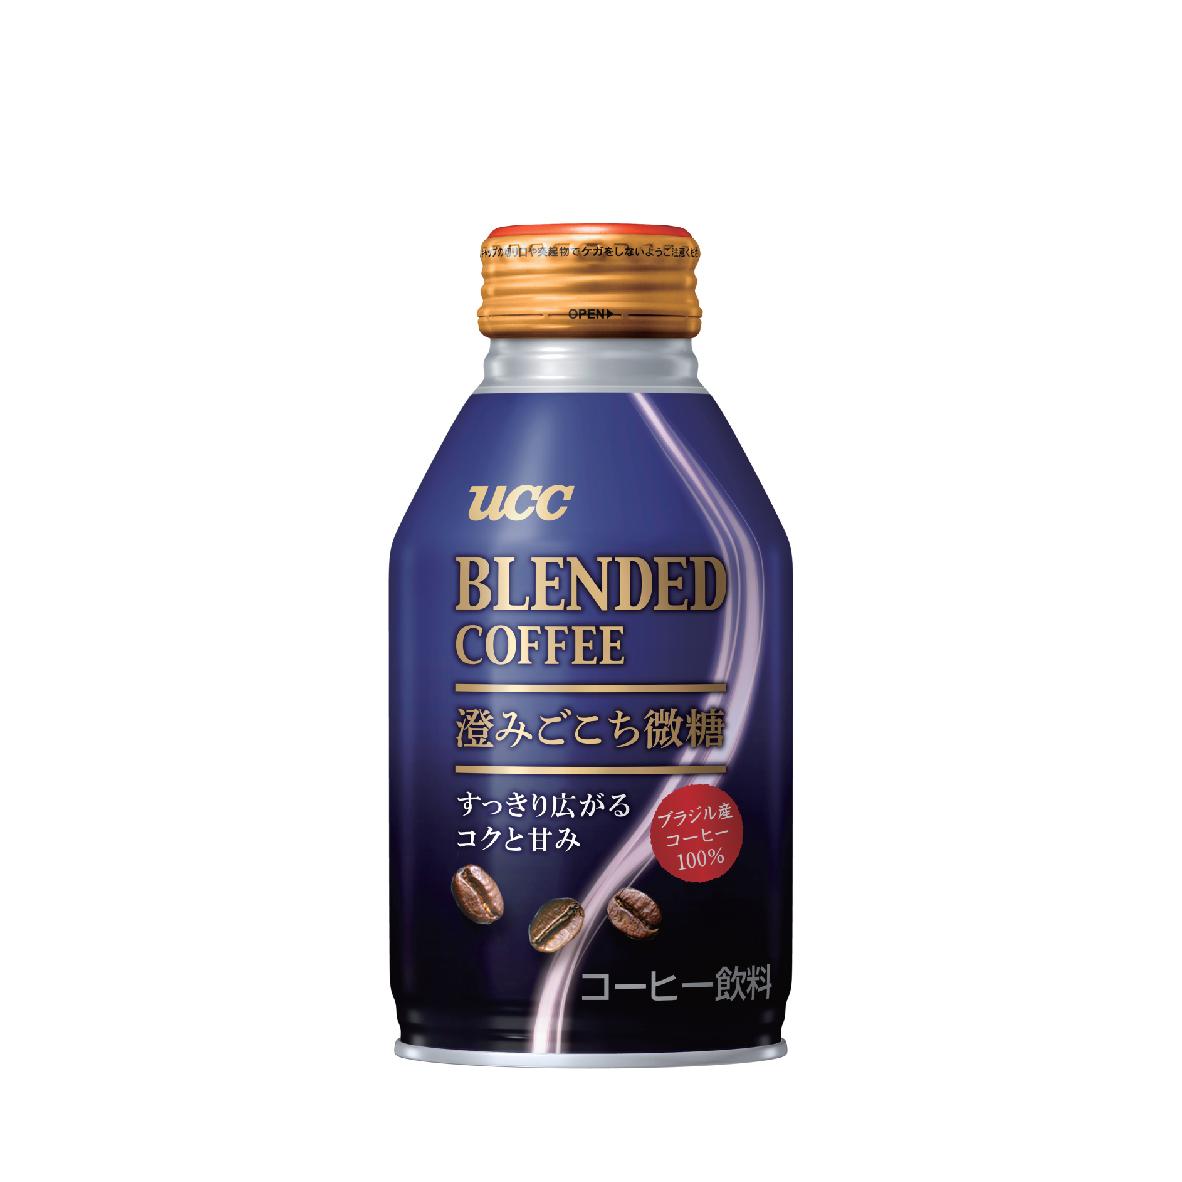 UCC Blended Coffee Less Sugar